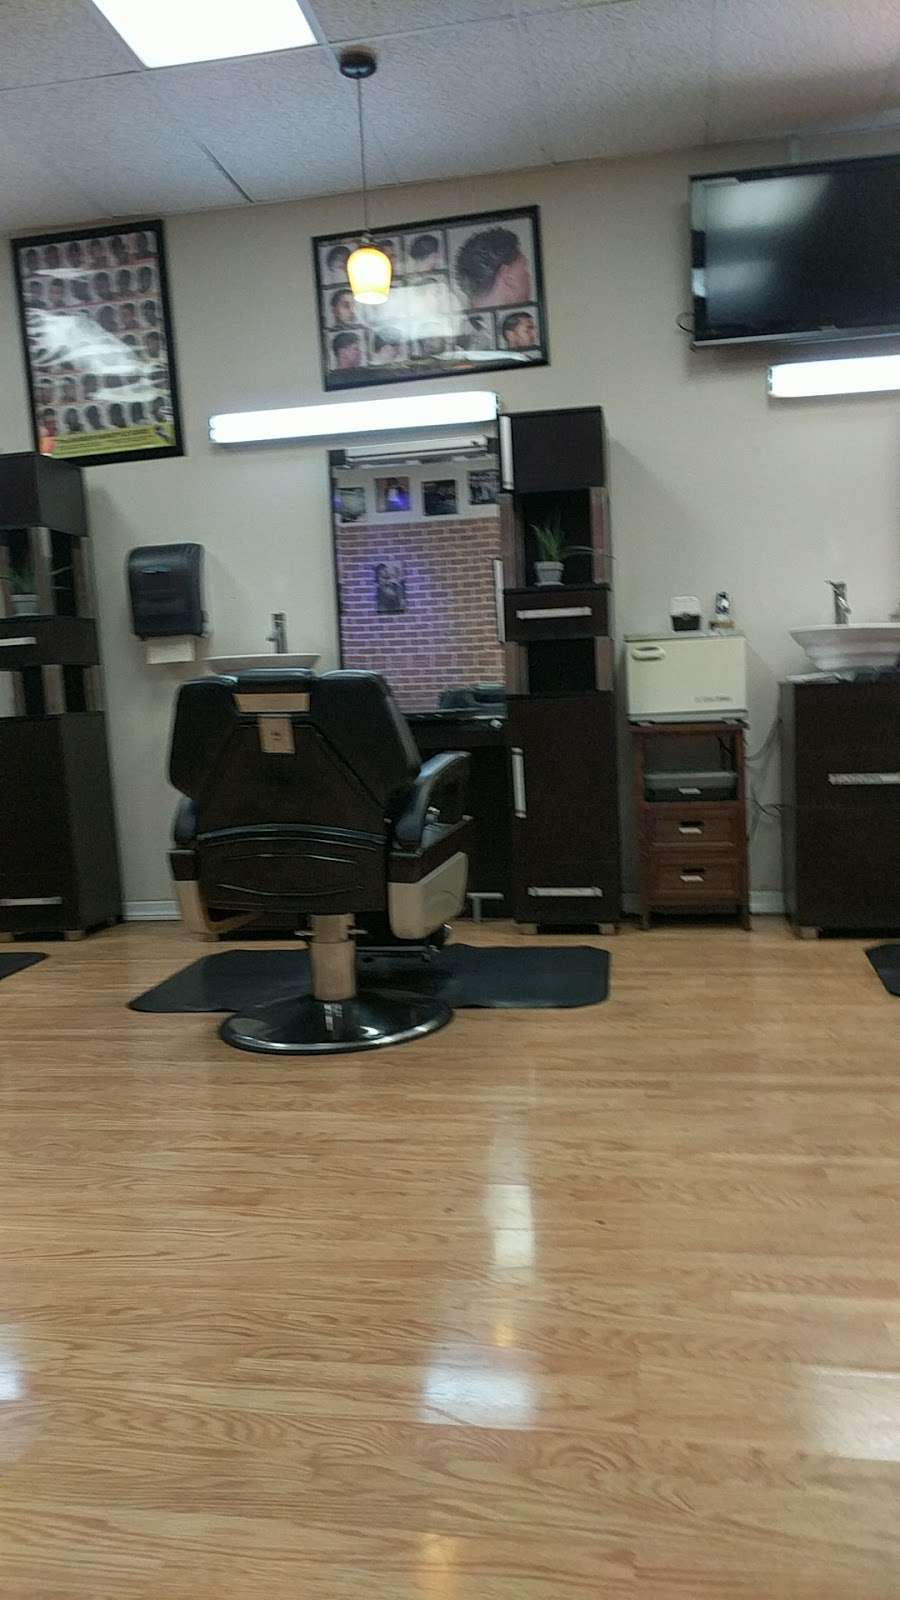 Nostalgic Soul Barber Studio, 9 San Pablo Ave, Pinole, CA 9, USA